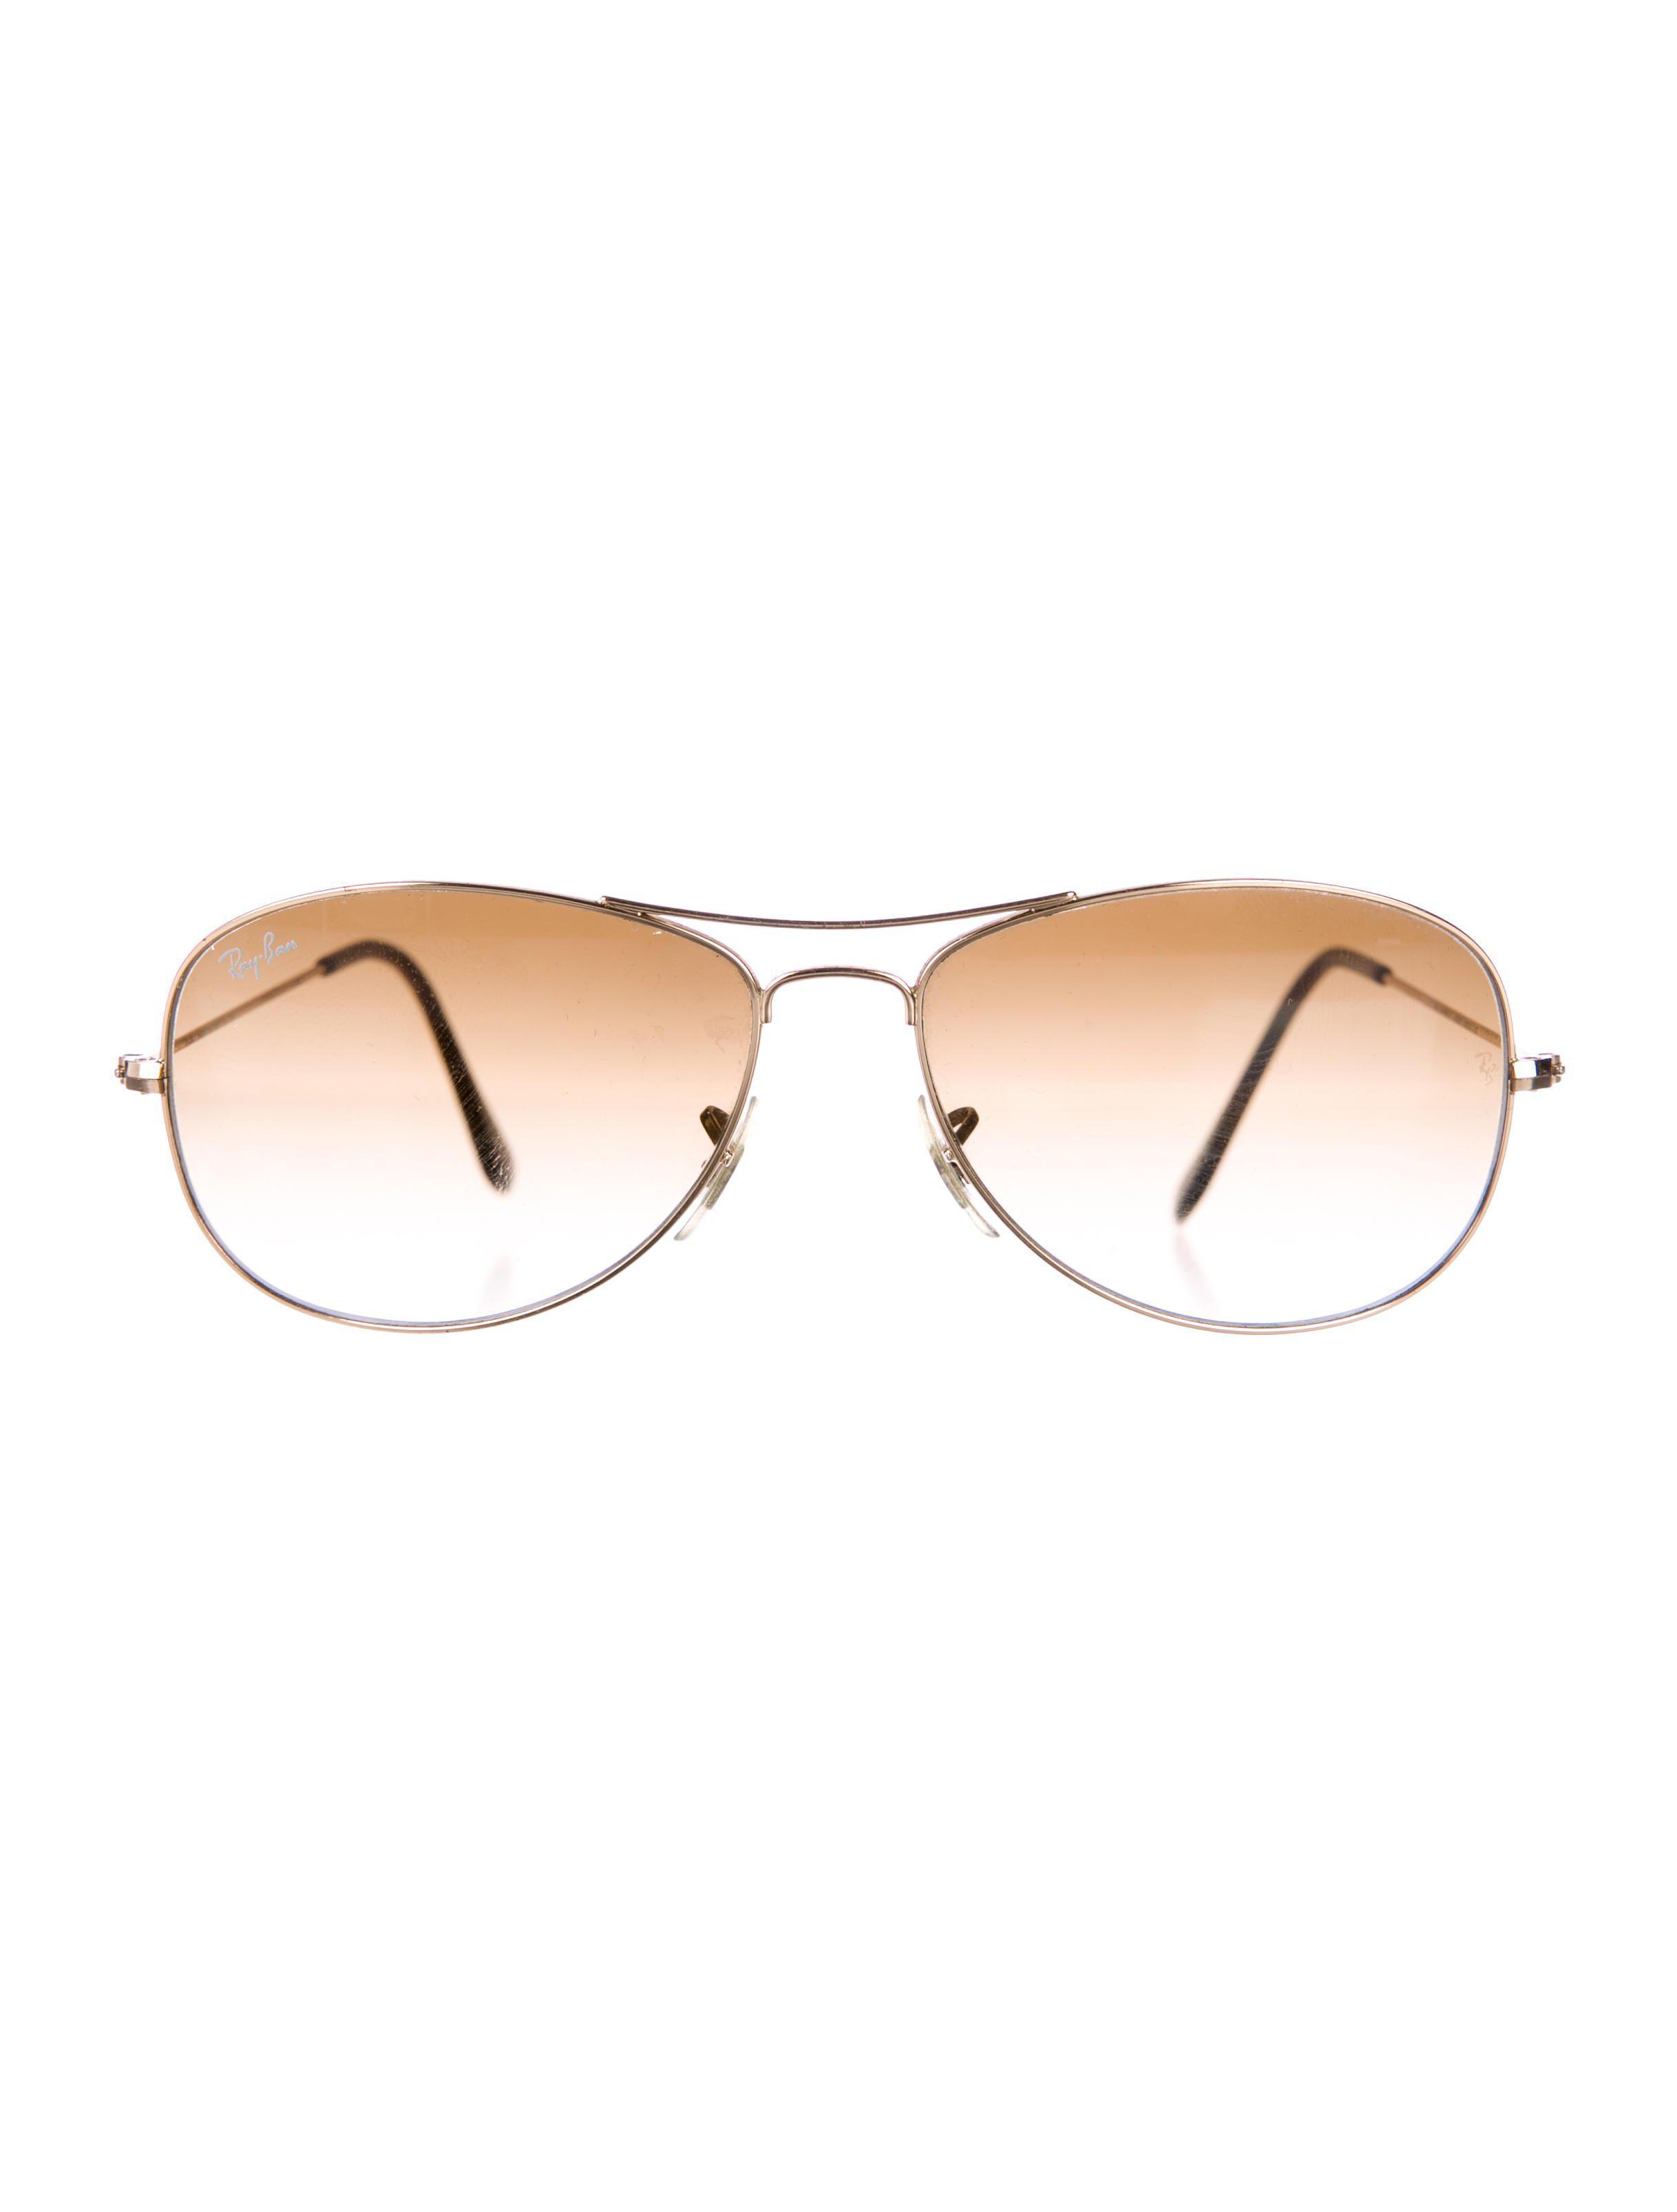 89366ce50b Lyst - Ray-Ban Cockpit Gradient Sunglasses Gold in Metallic